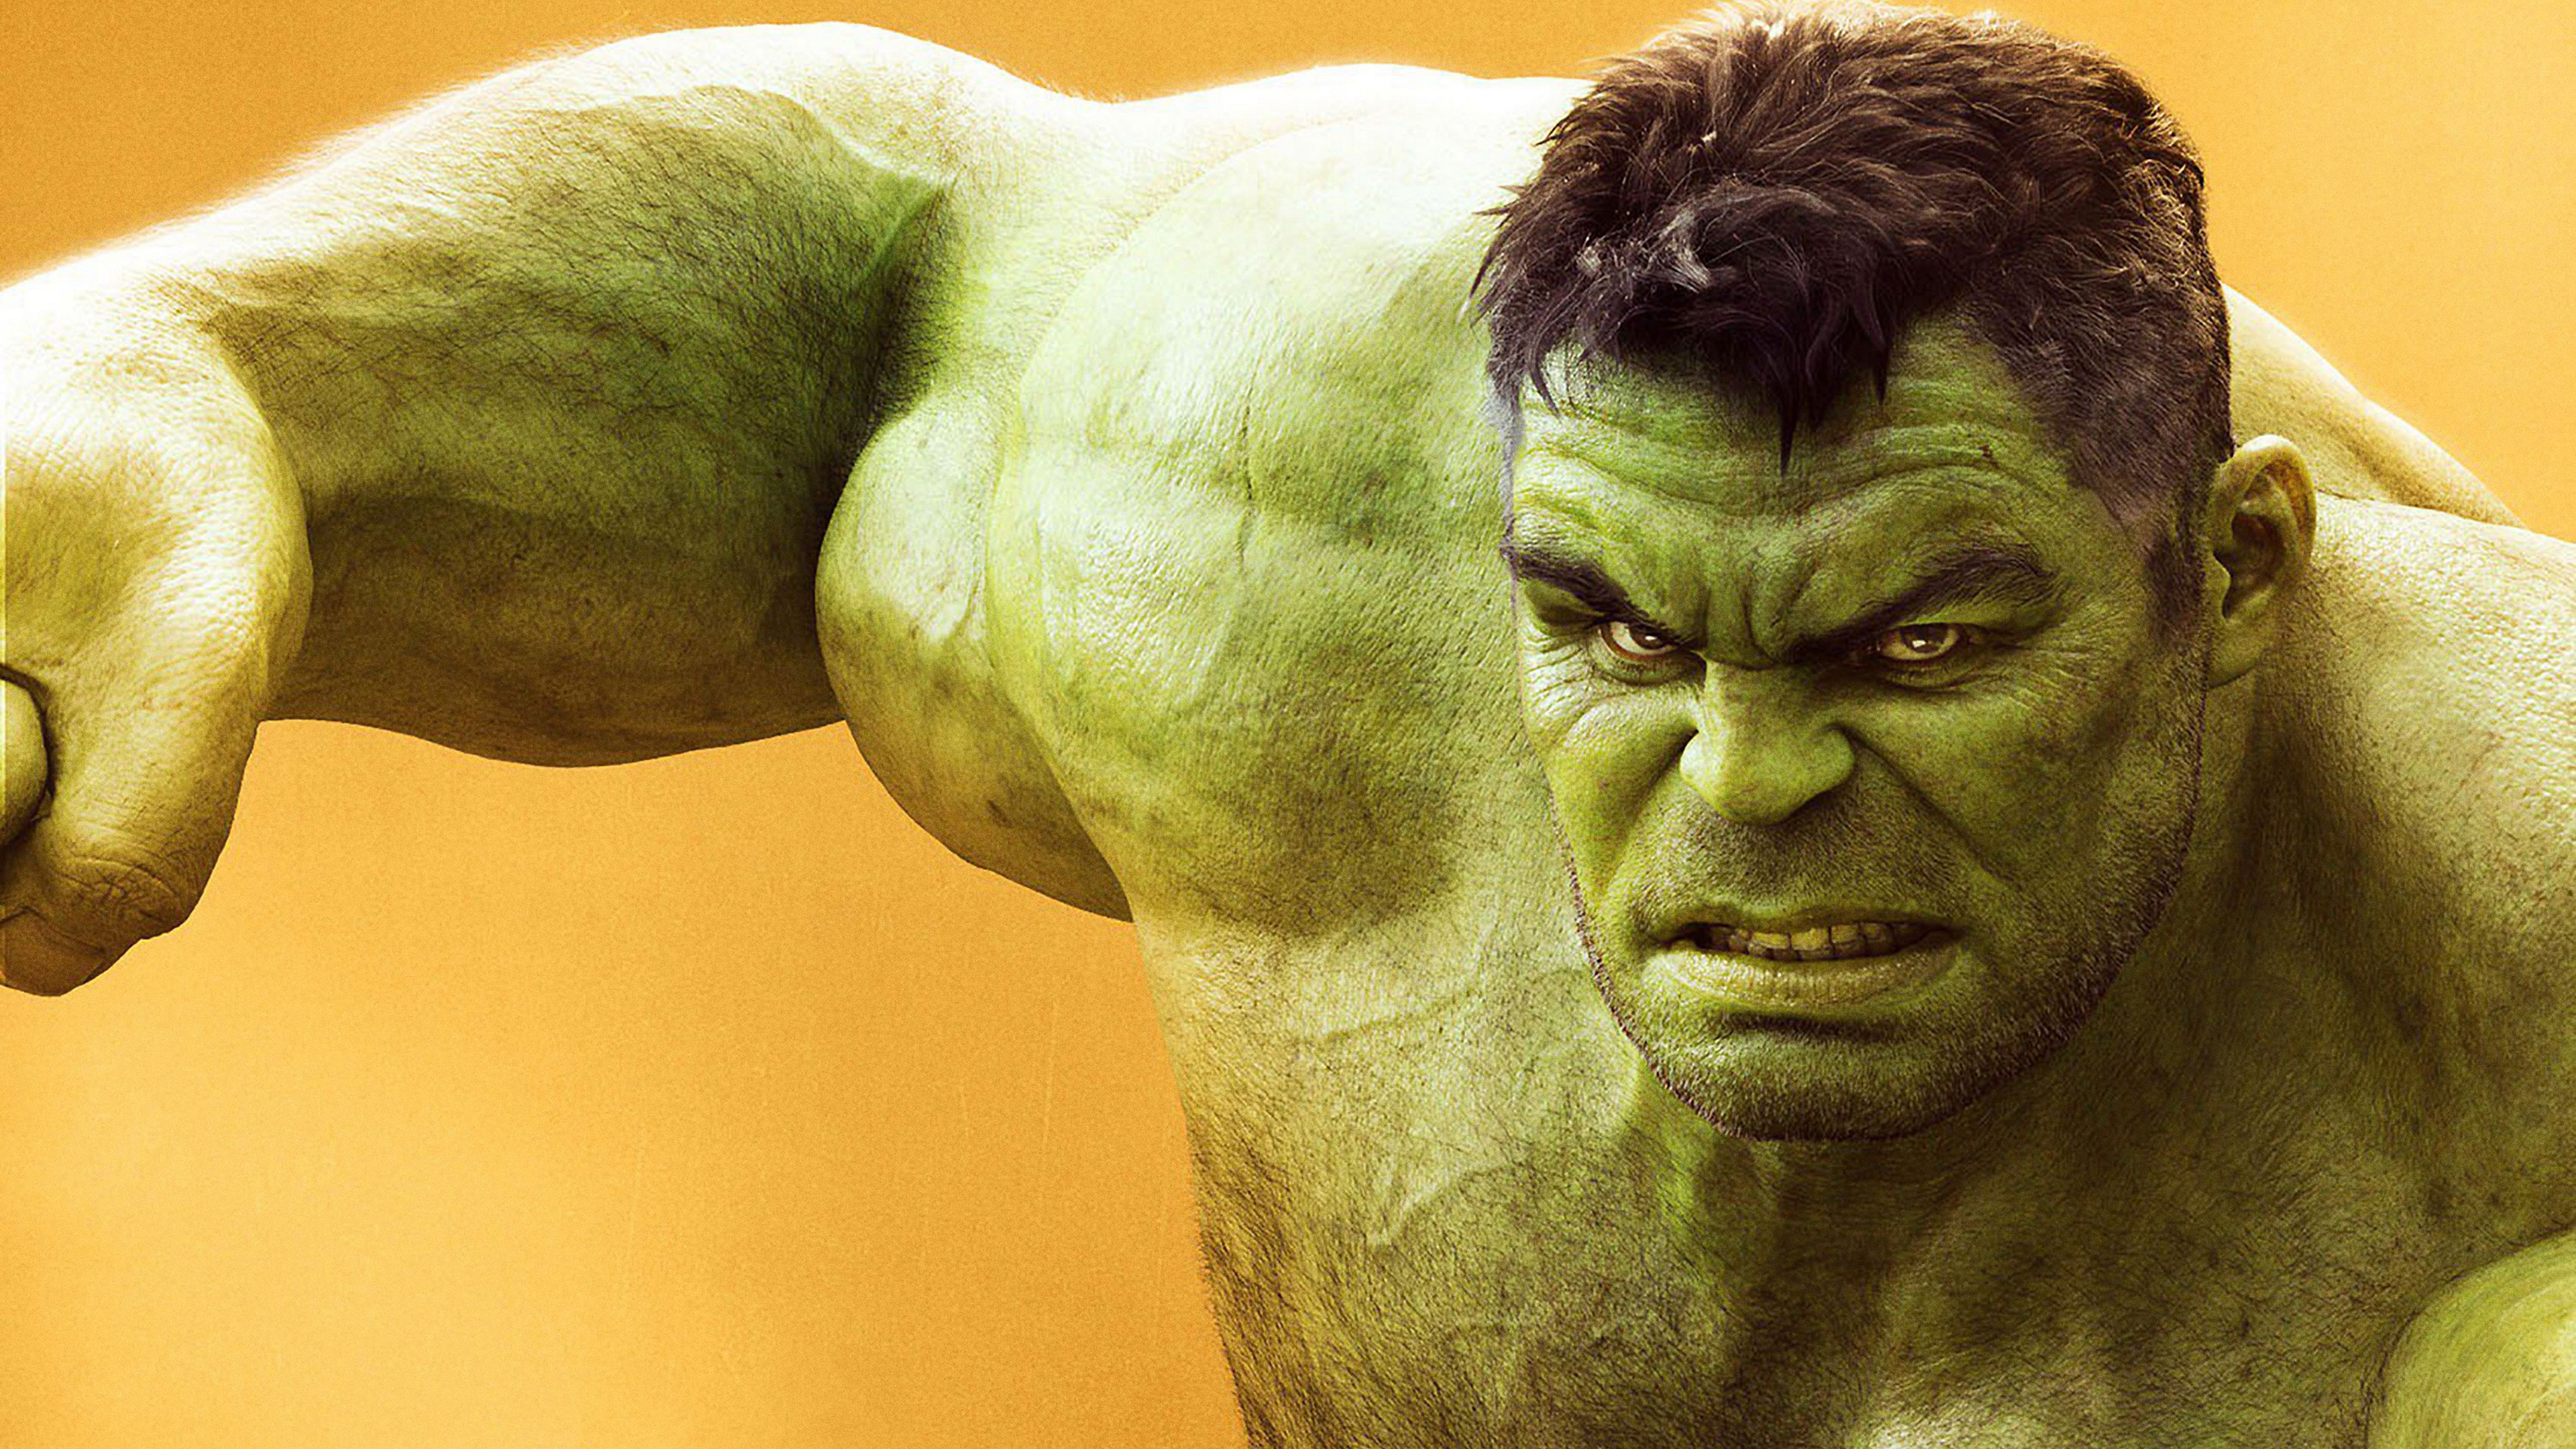 Hulk in Avengers Infinity War 4K Wallpapers HD Wallpapers 3840x2160